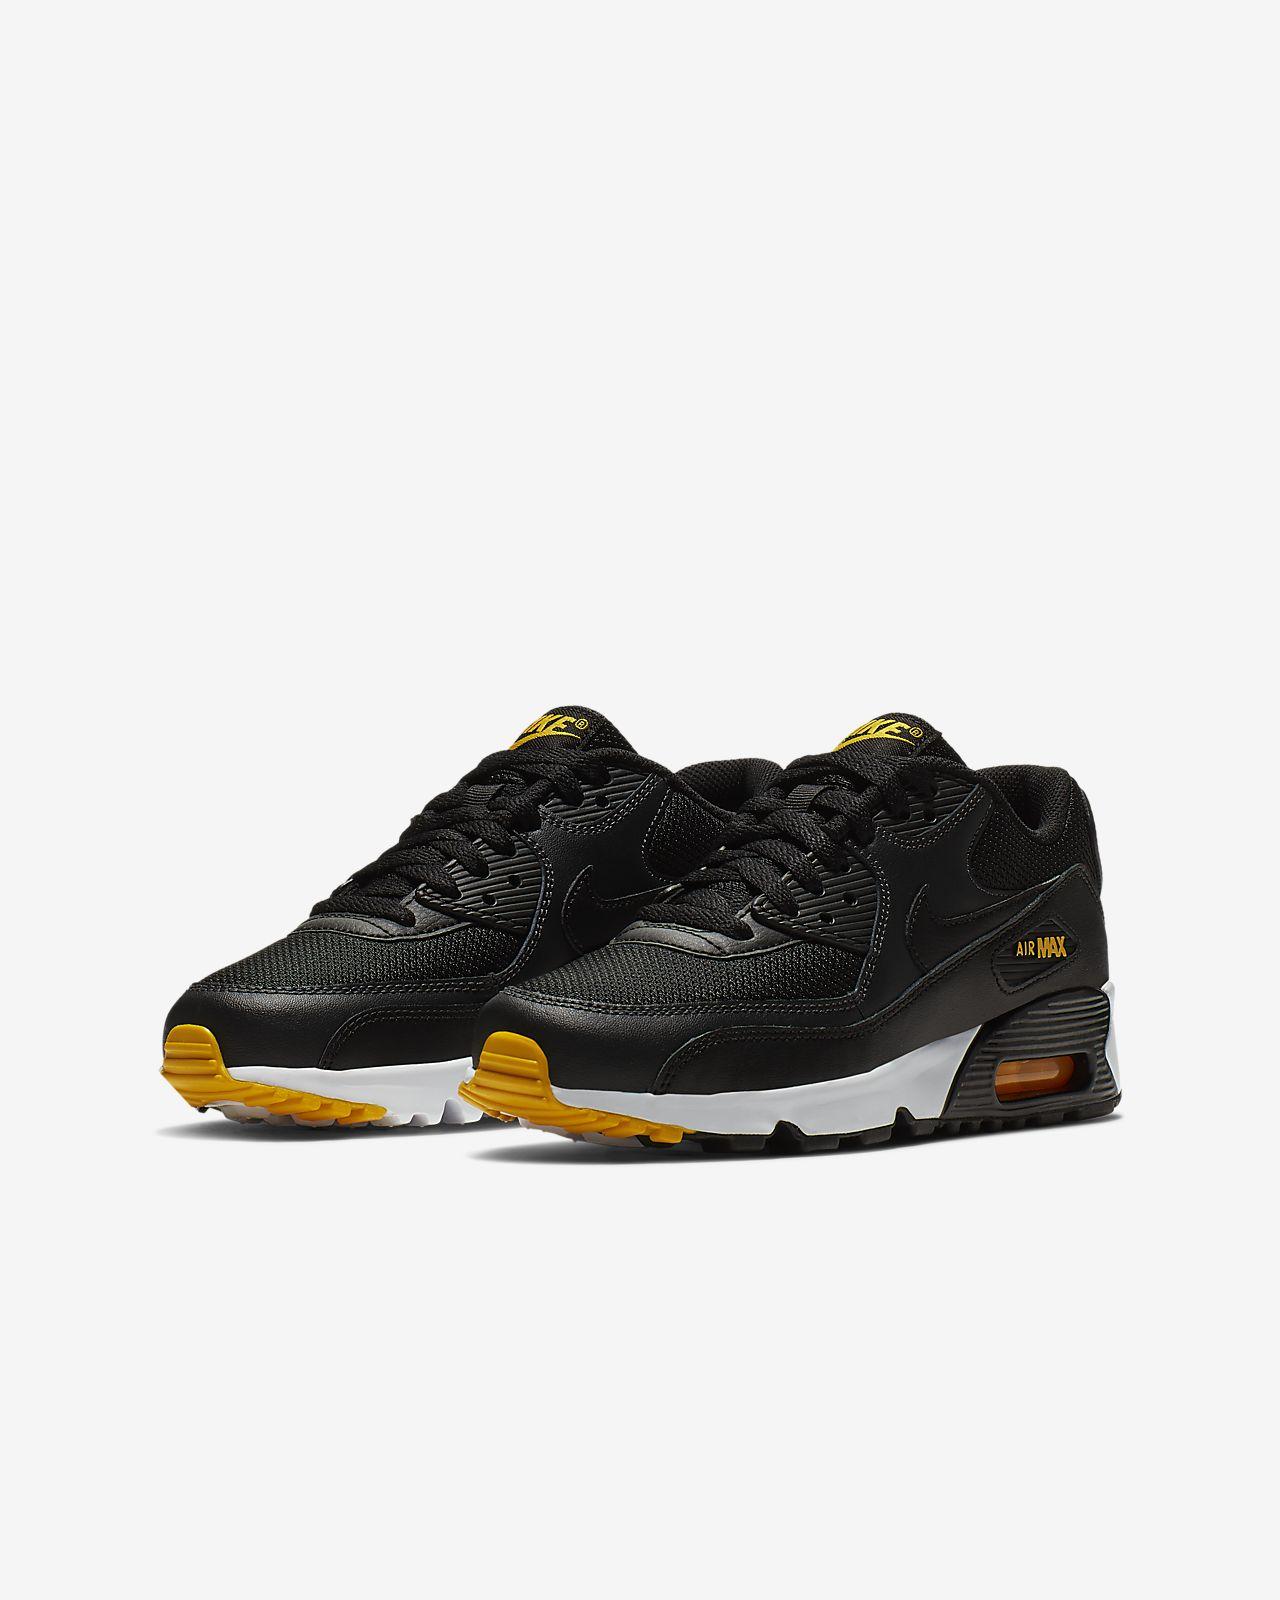 check out 6089c 6c163 ... Nike Air Max 90 Mesh Older Kids  Shoe